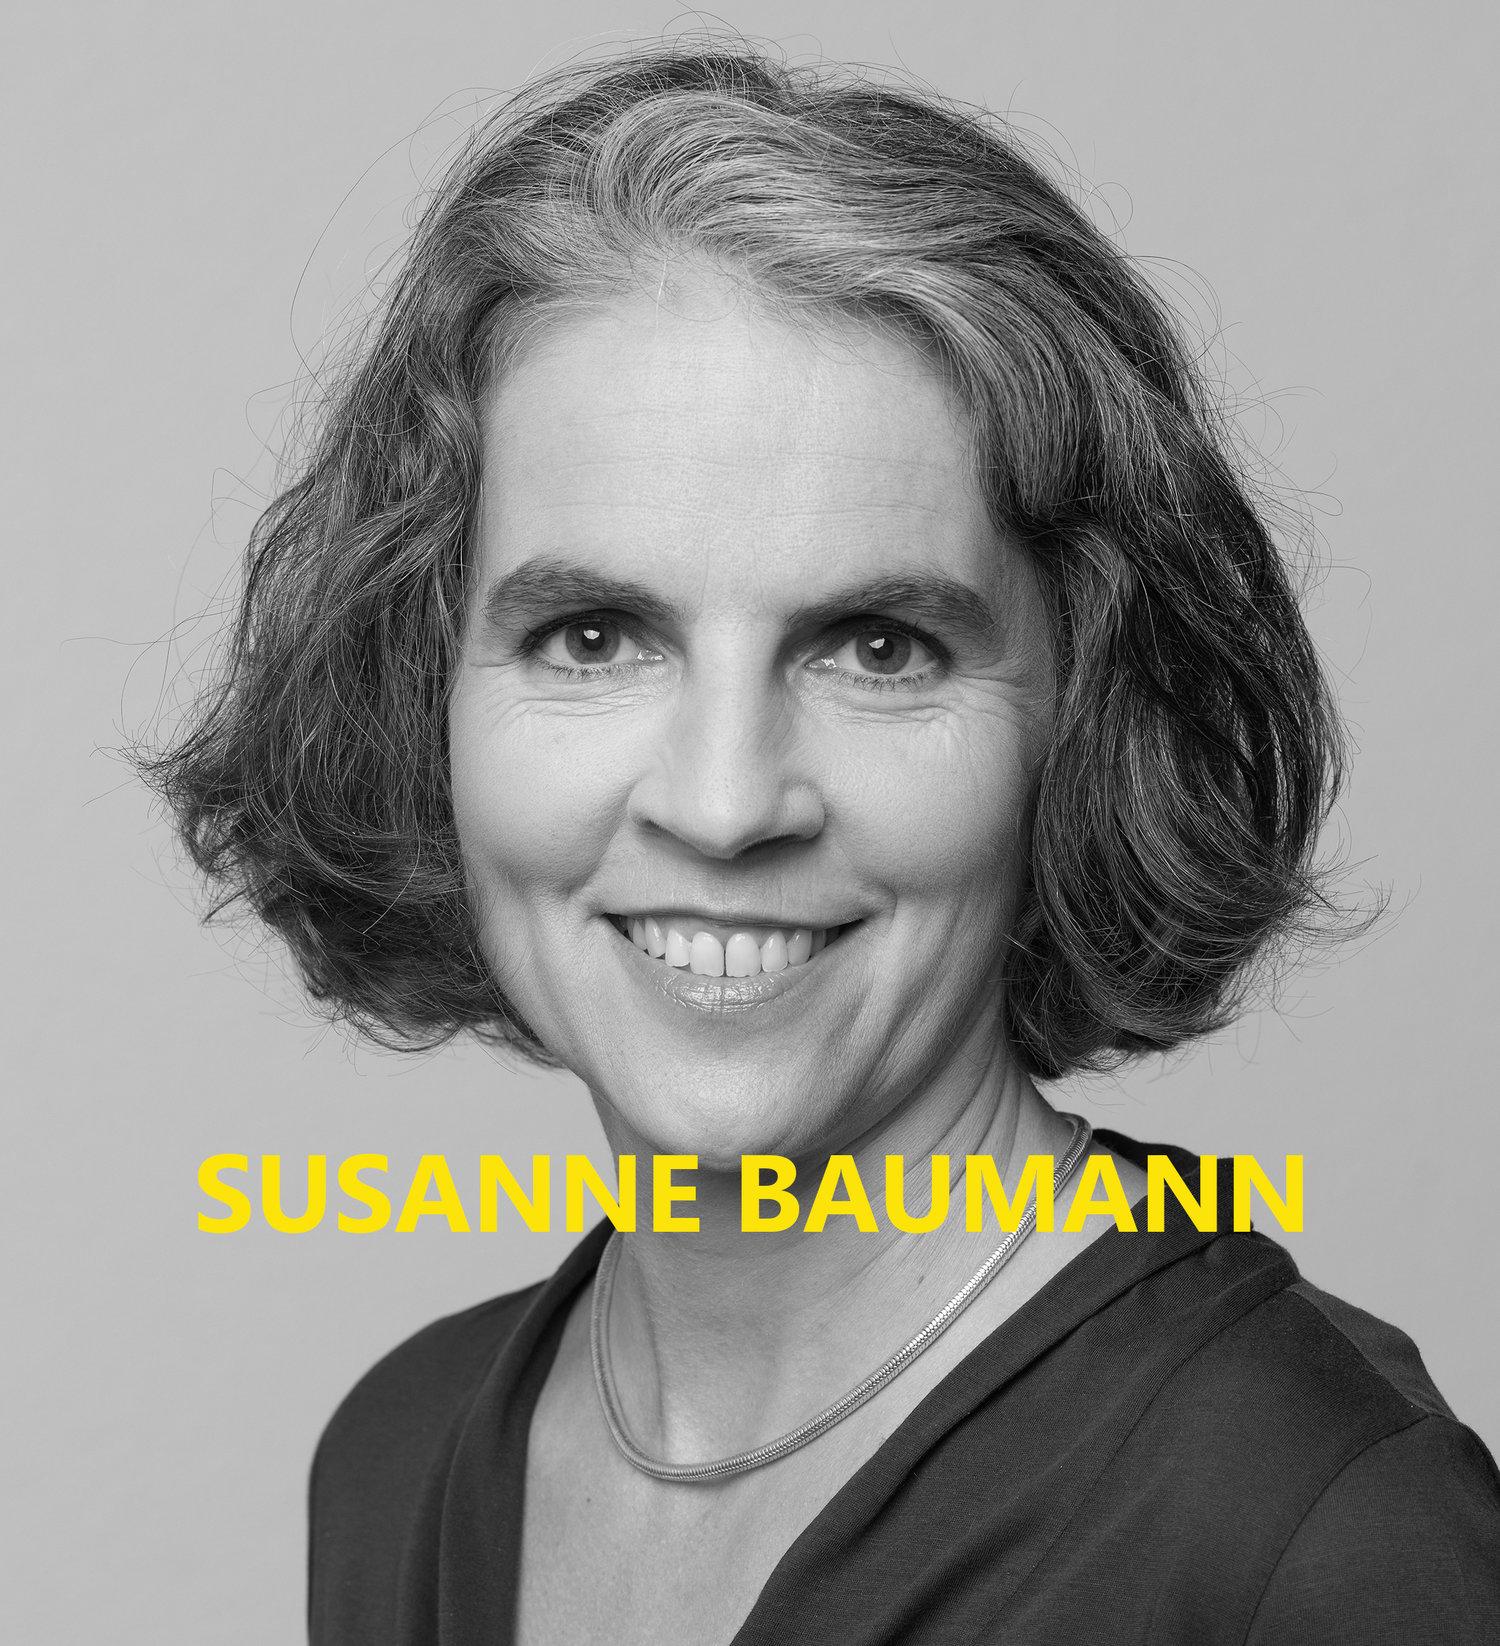 Susanne Baumann (Integrale Politik)